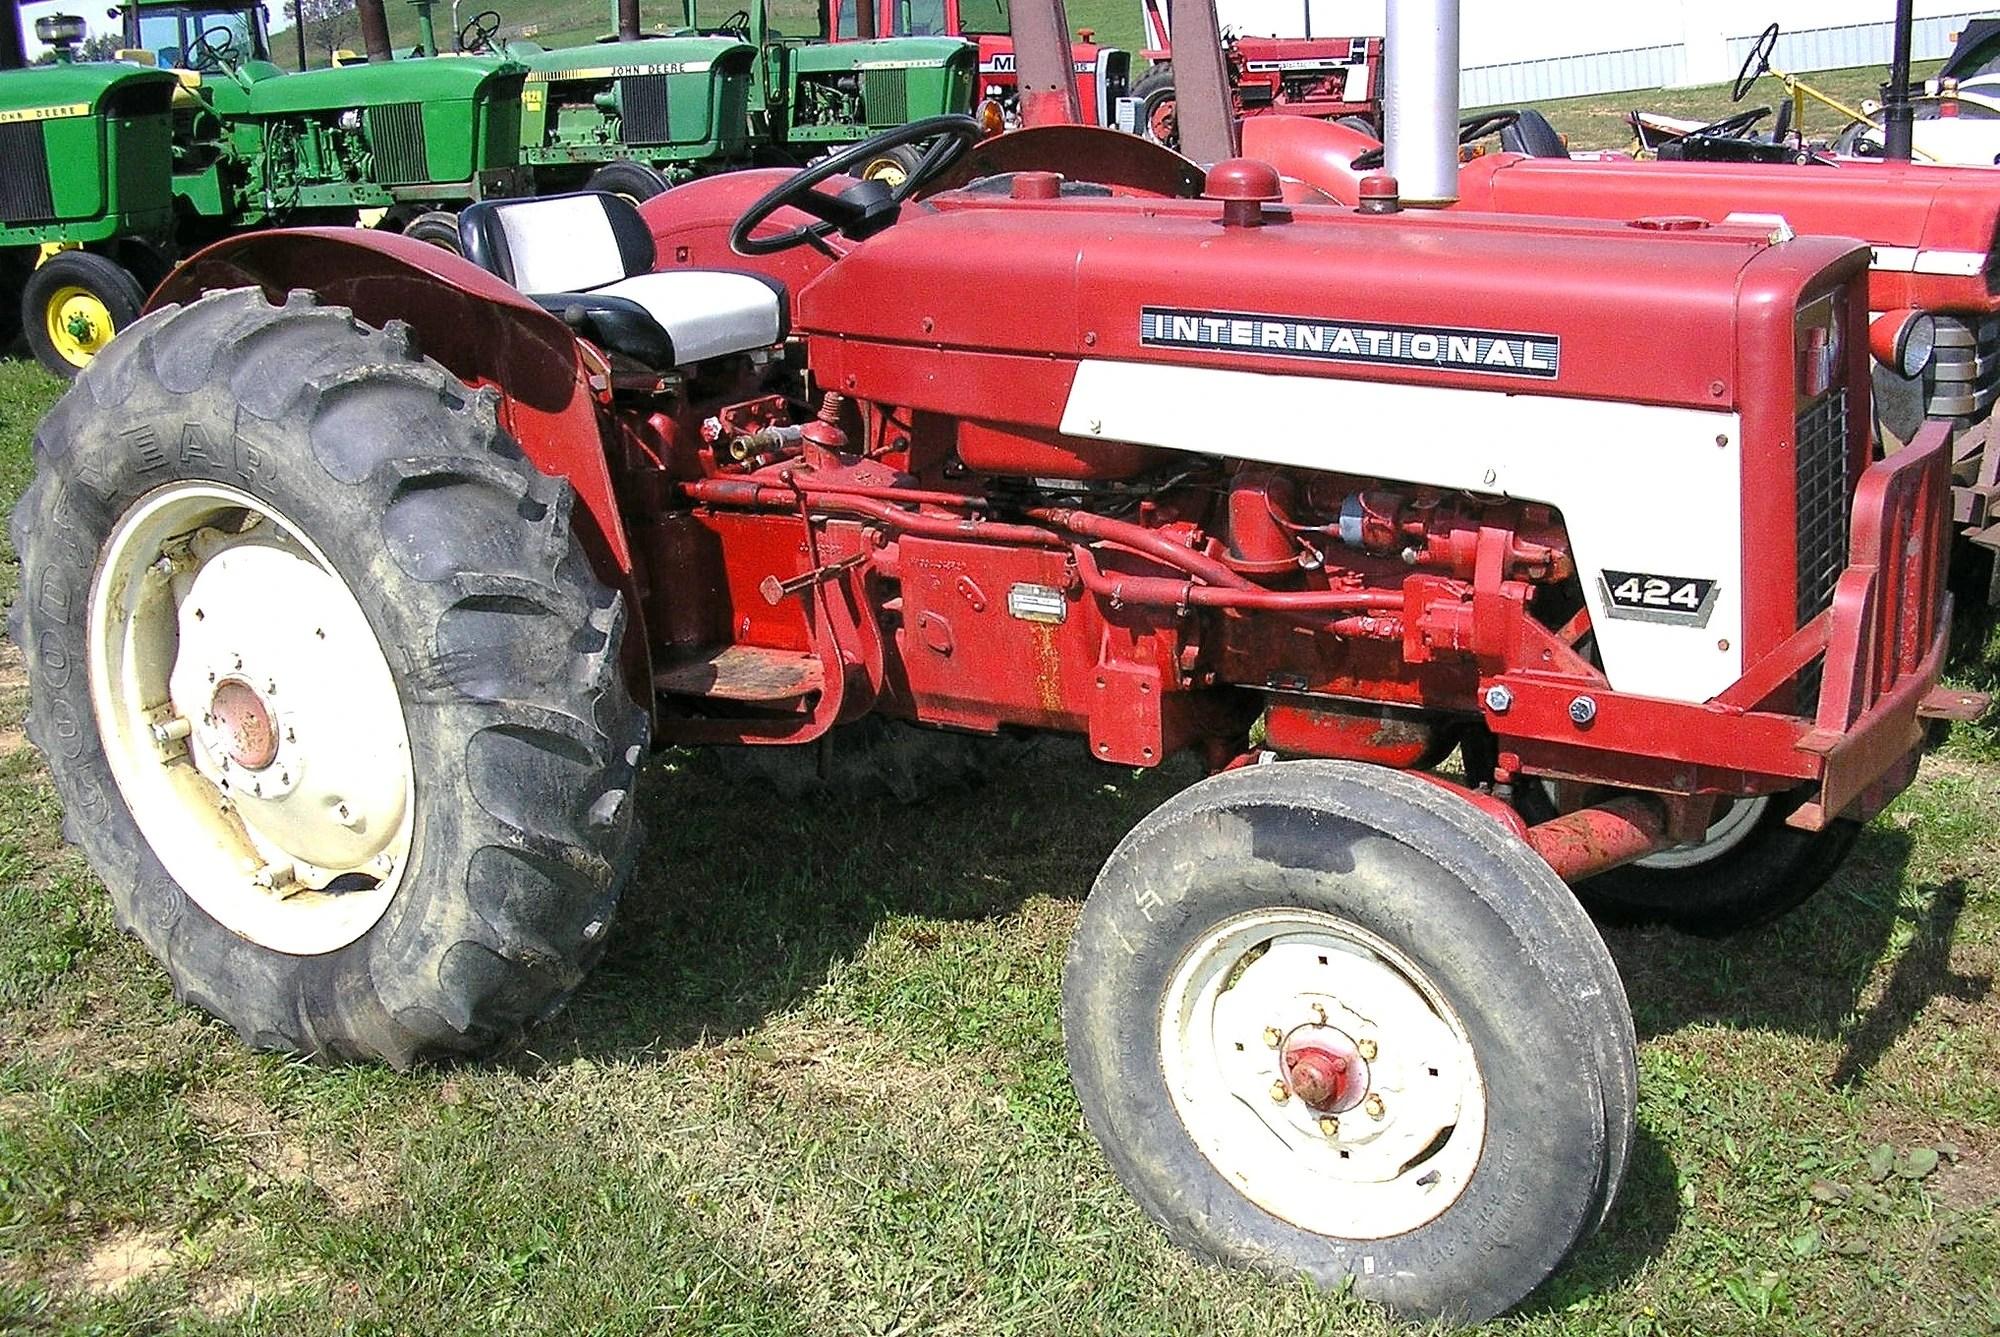 small resolution of international harvester 424 tractor construction plant wiki international harvester 454 tractor on 806 farmall pto parts diagram